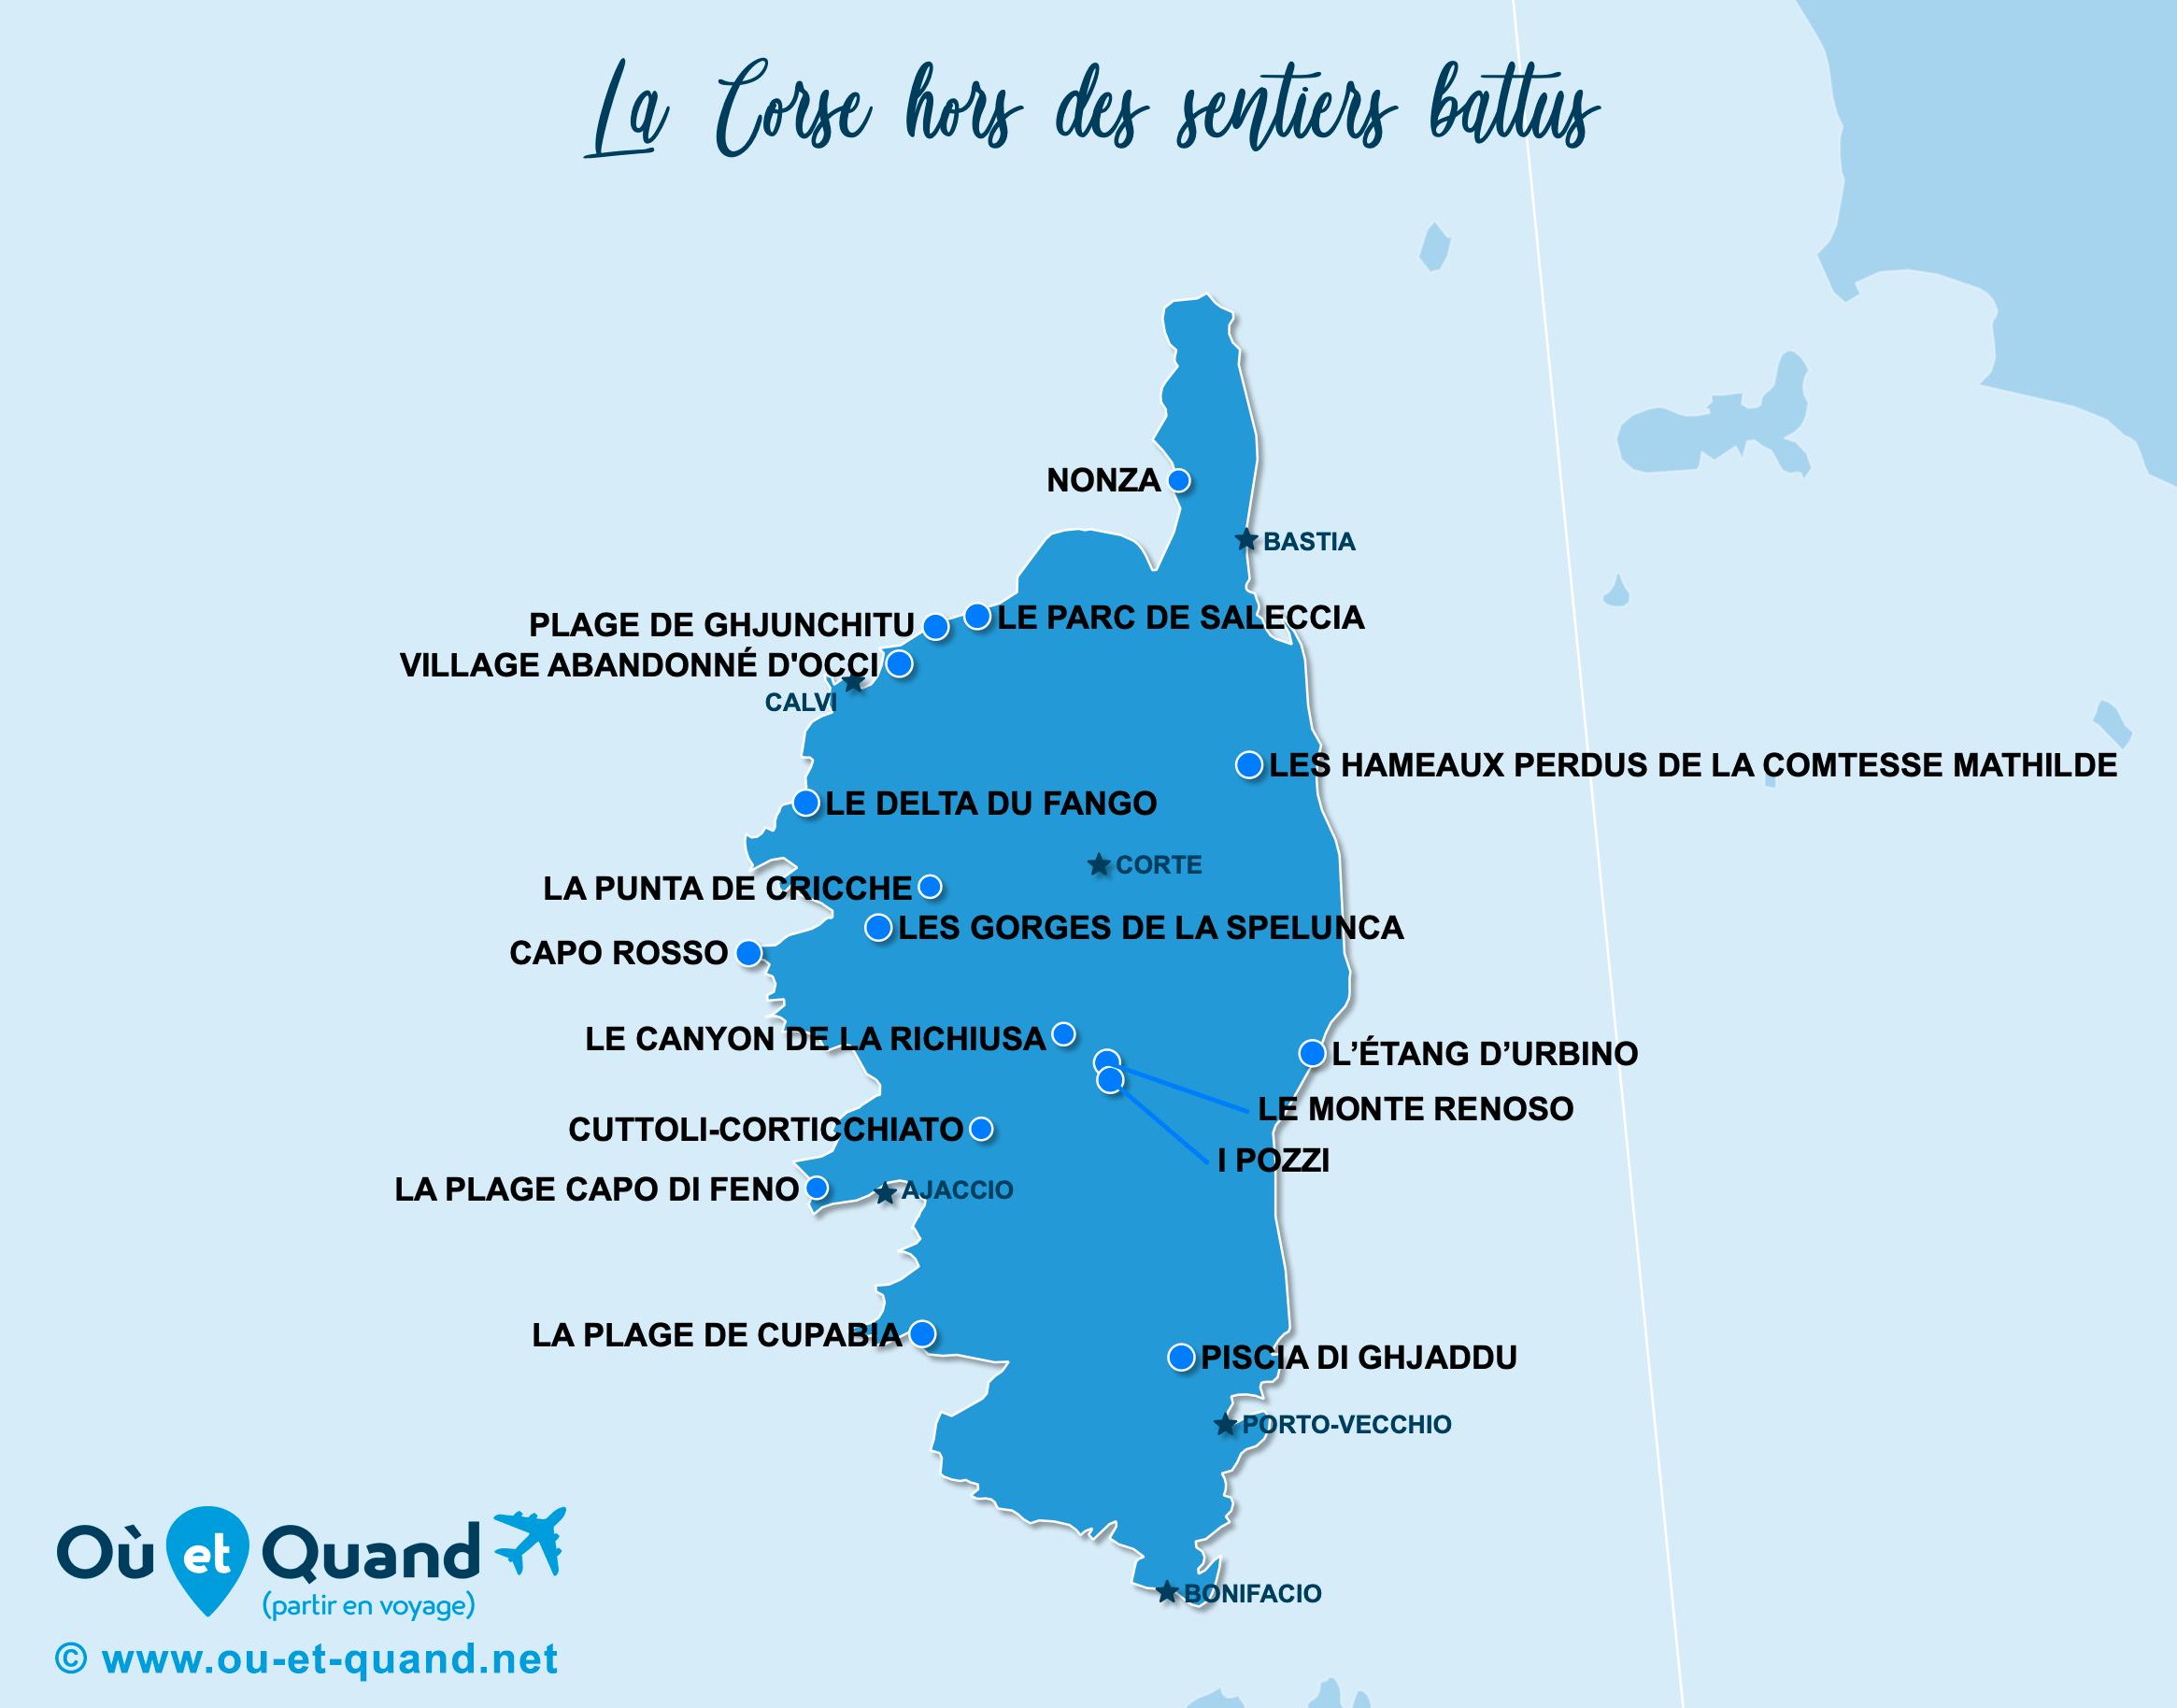 Carte Corse : La Corse hors des sentiers battus